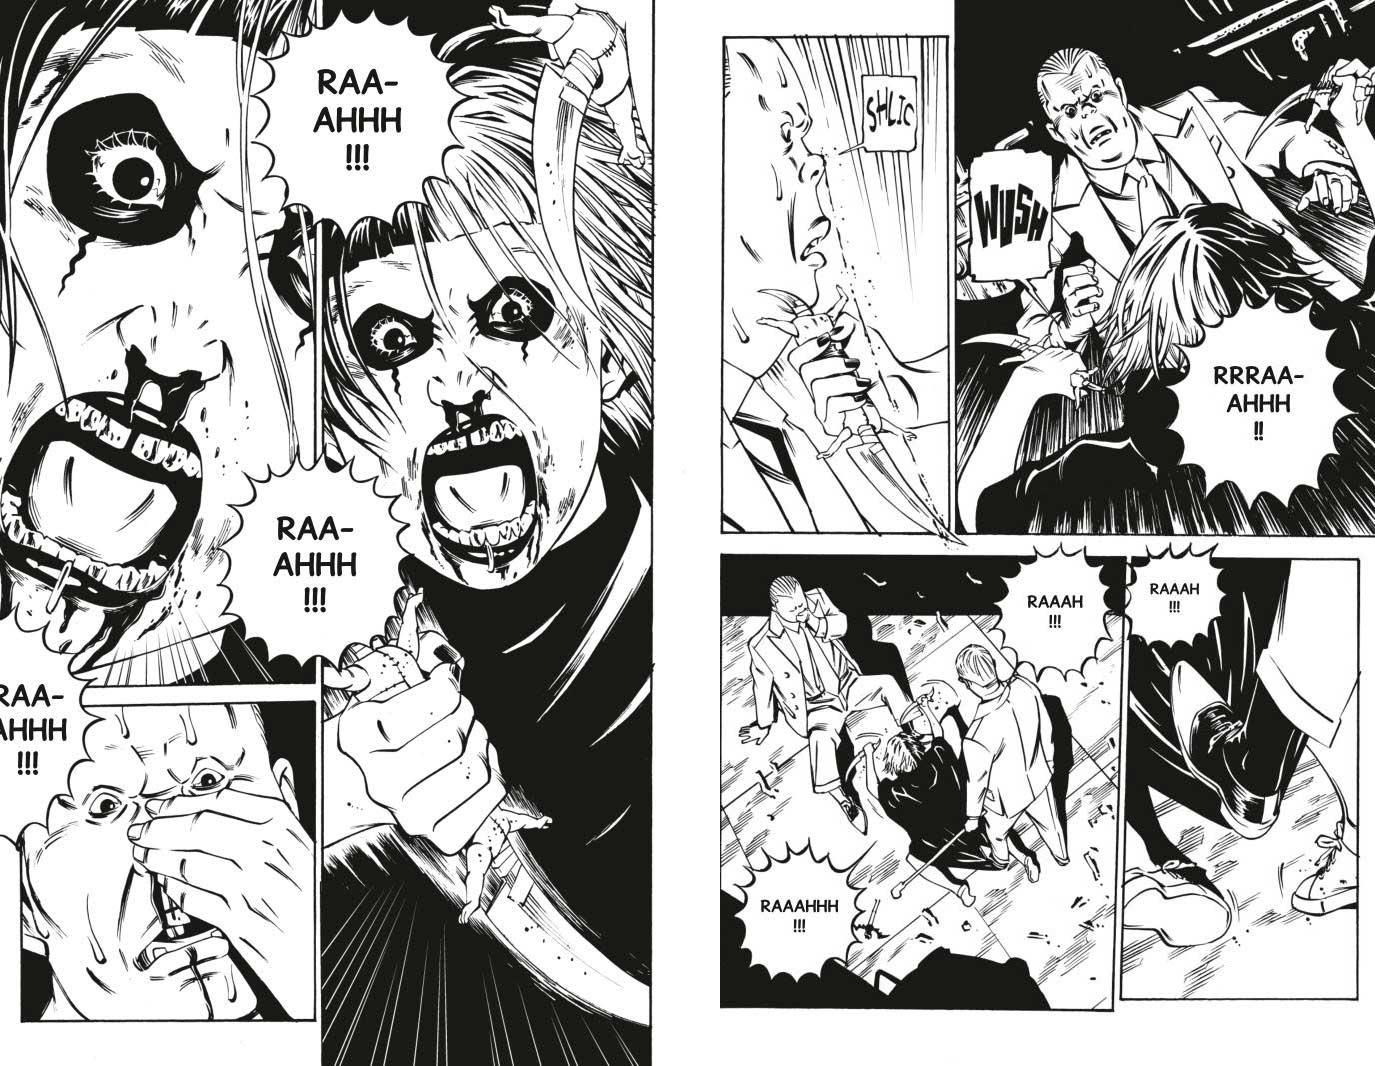 Atsushi Kaneko - Deathco - Casterman - Folie